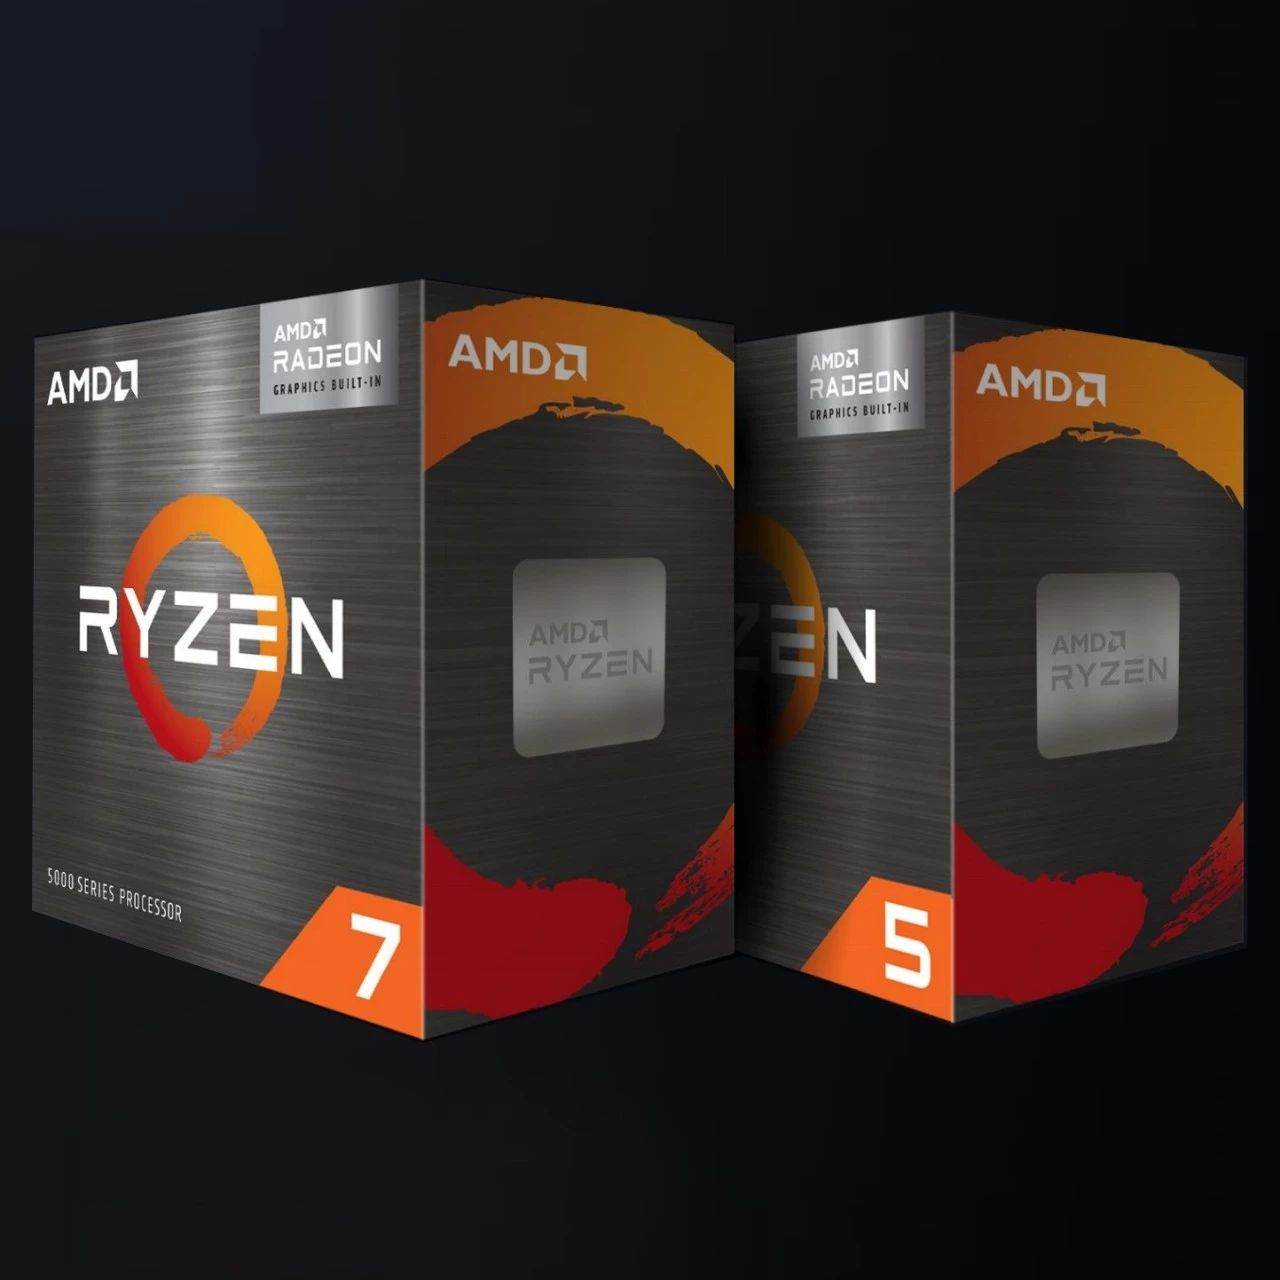 AMD放大招:锐龙5000G零售版、RX 6000M移动版显卡终于来了!